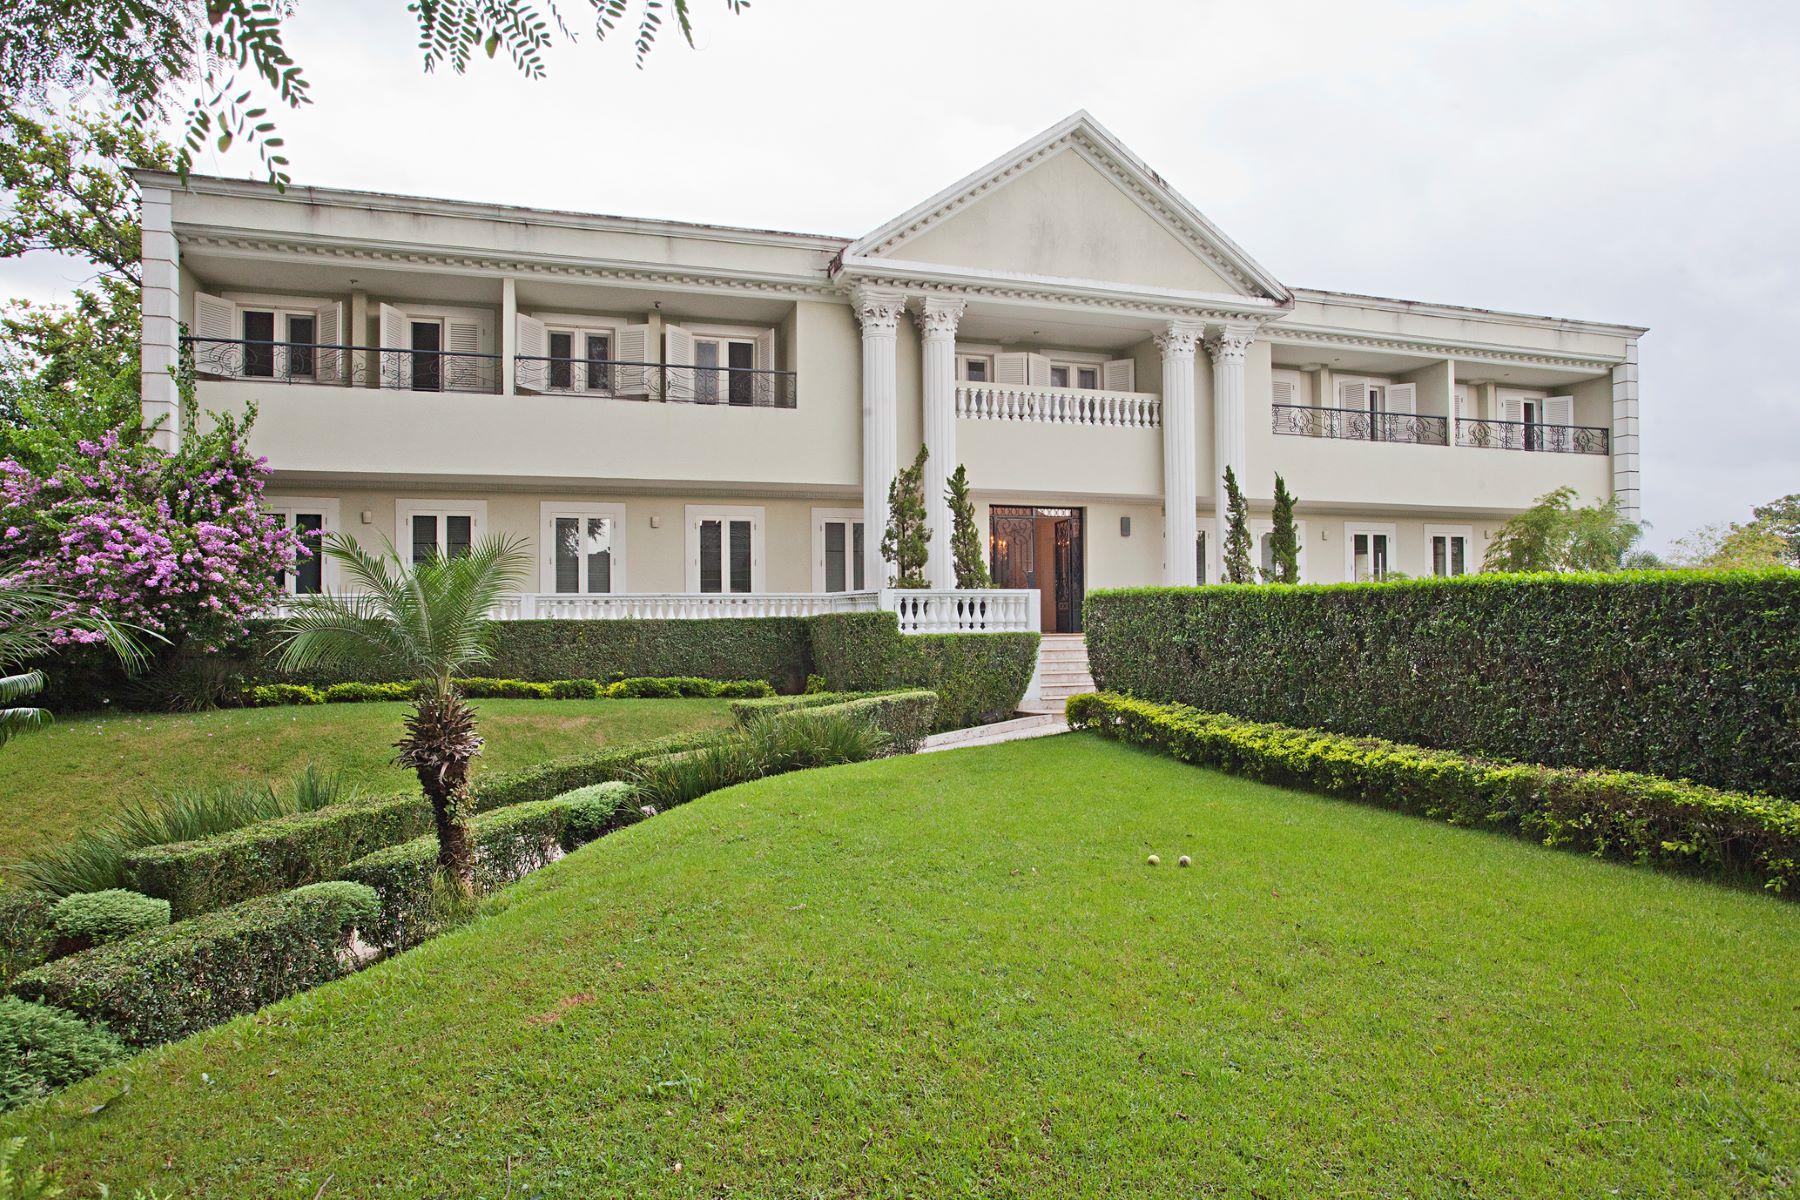 Single Family Home for Sale at Stunning house with private tennis court Rua General Pereira da Cunha Sao Paulo, Sao Paulo, 05692060 Brazil